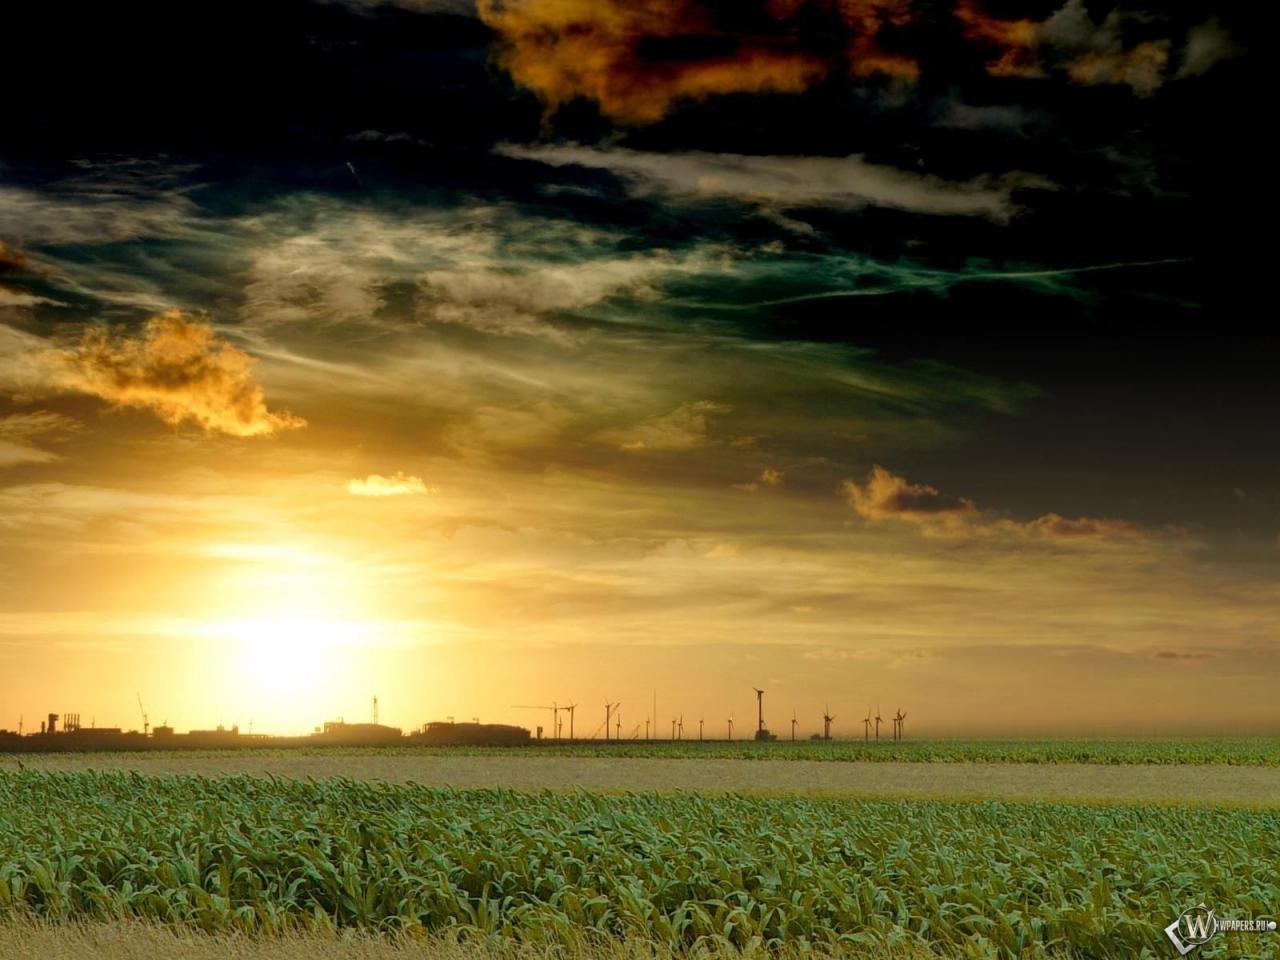 Природа солнце обоев 201 ветряки обоев